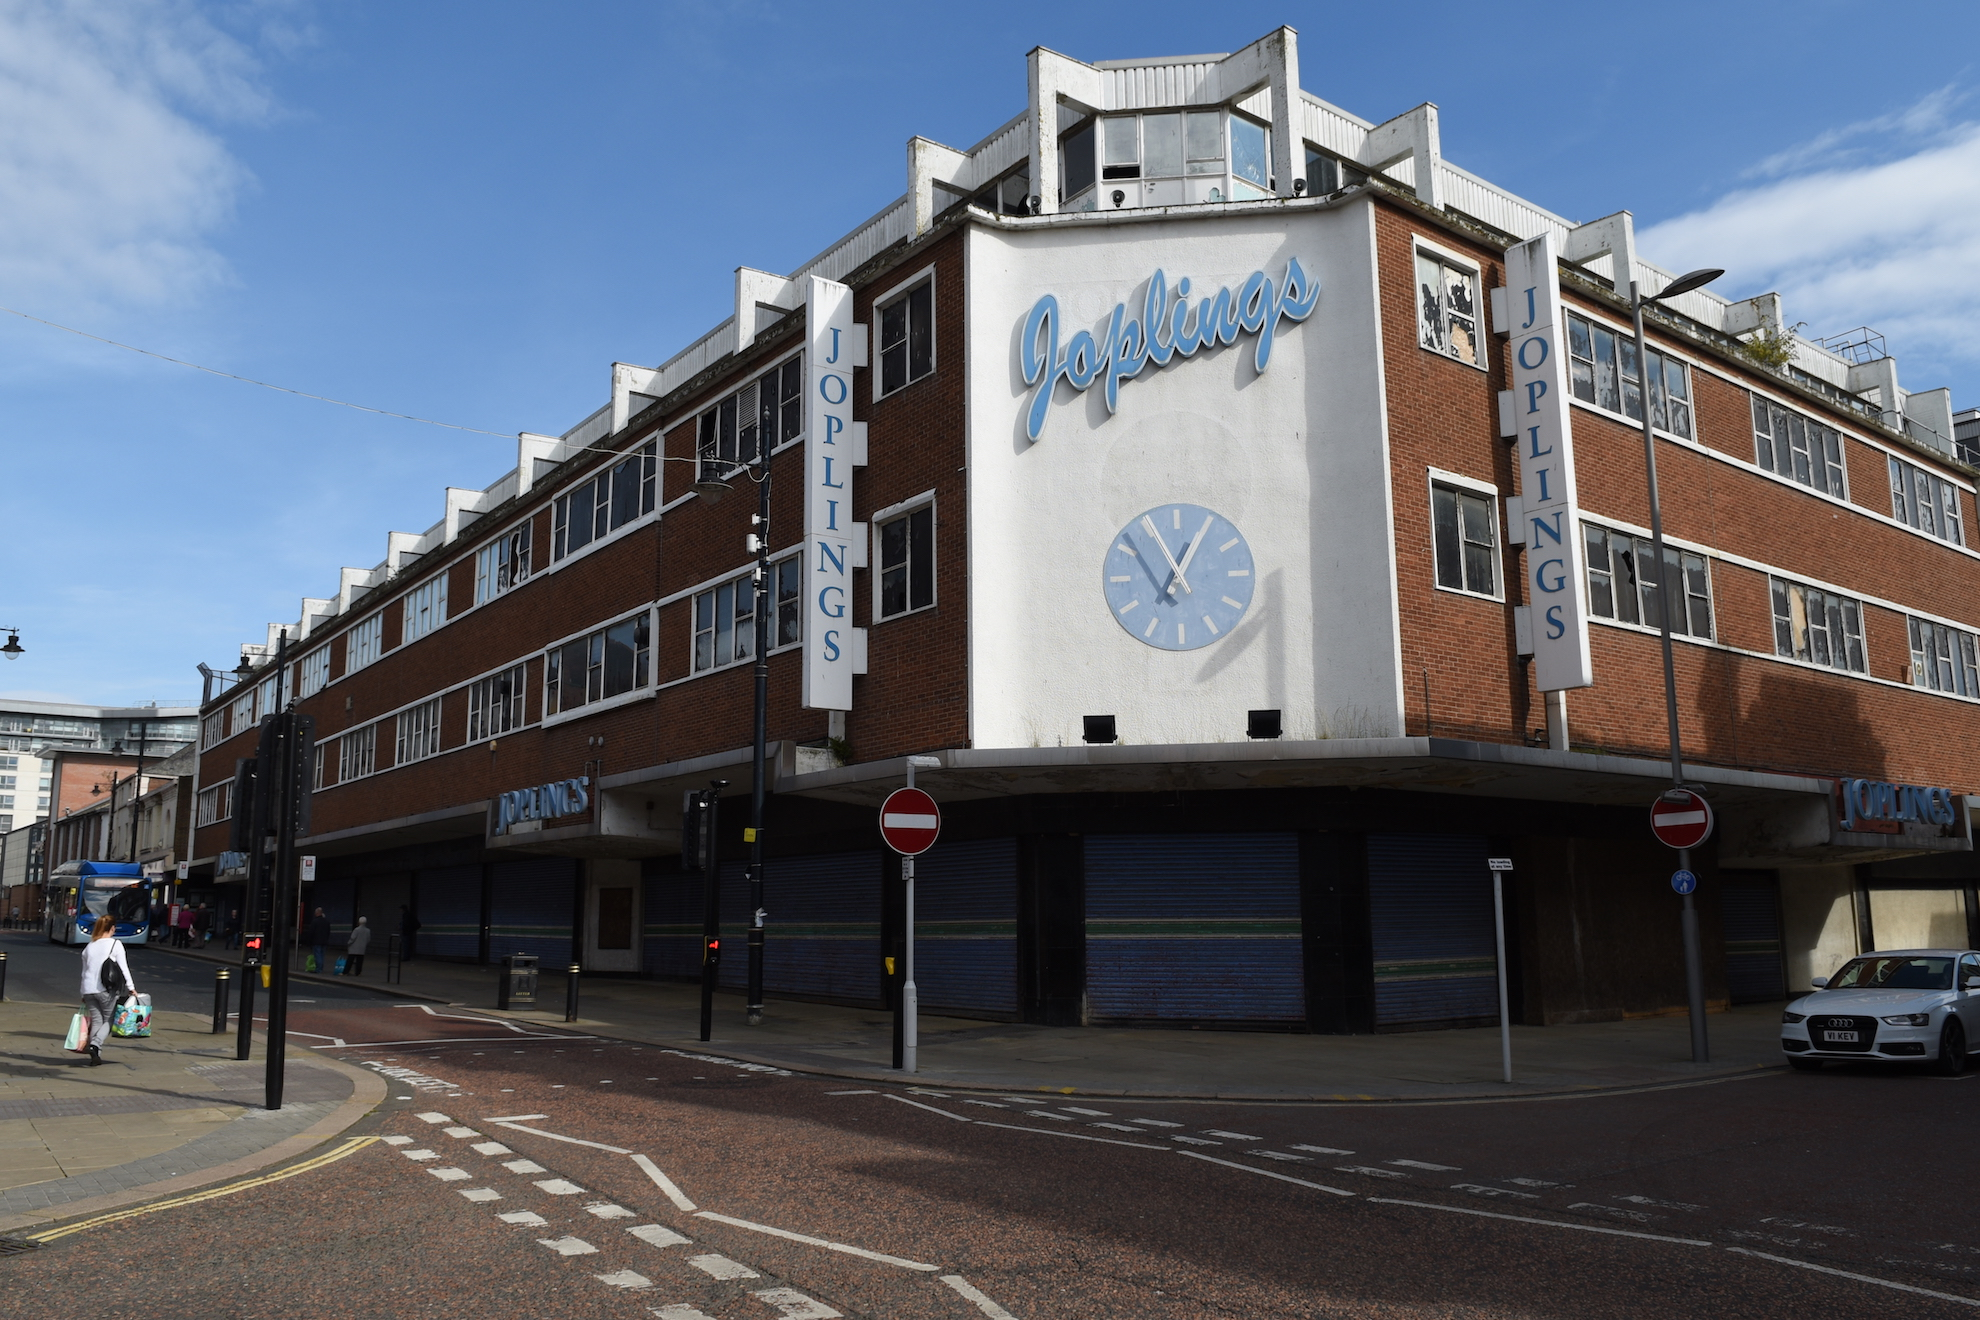 Developer Reveals Plan to turn Sunderland's former Joplings Department Store into Student Flats